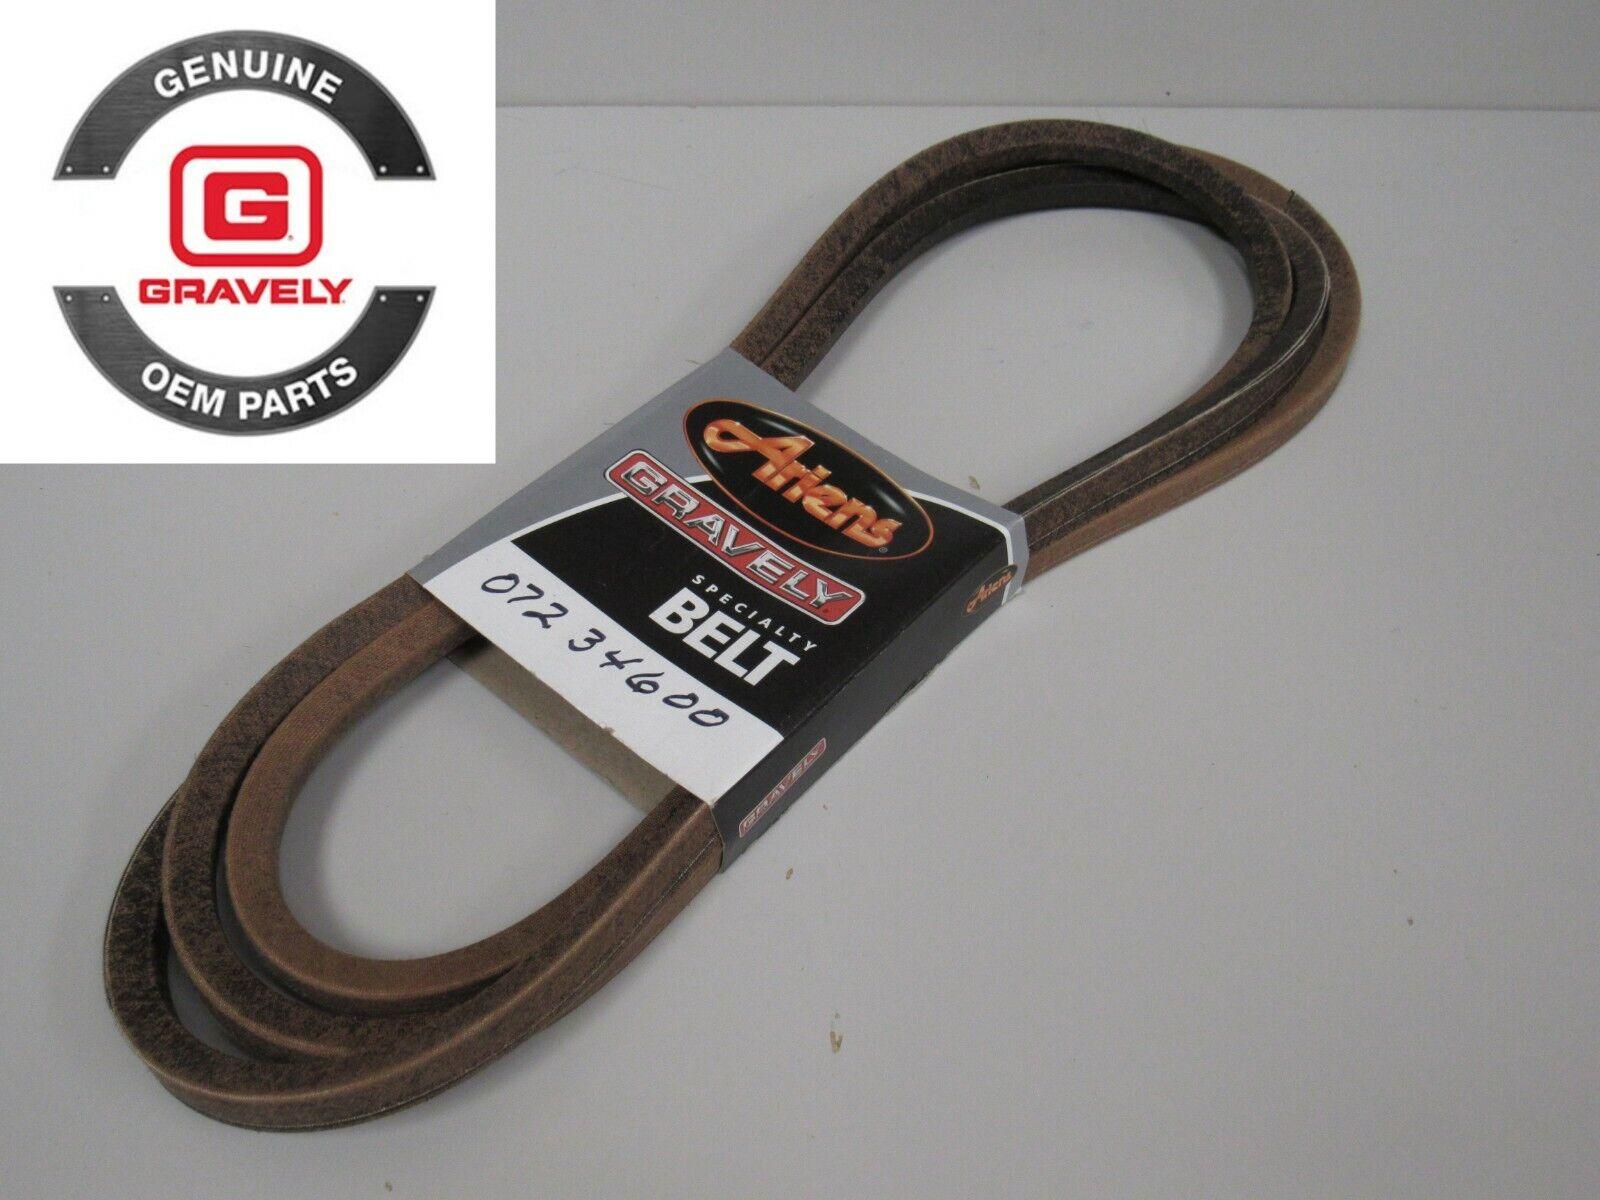 Genuine OEM cinturón envuelto V Ariens Gravely HB  07234600,  envío rápido